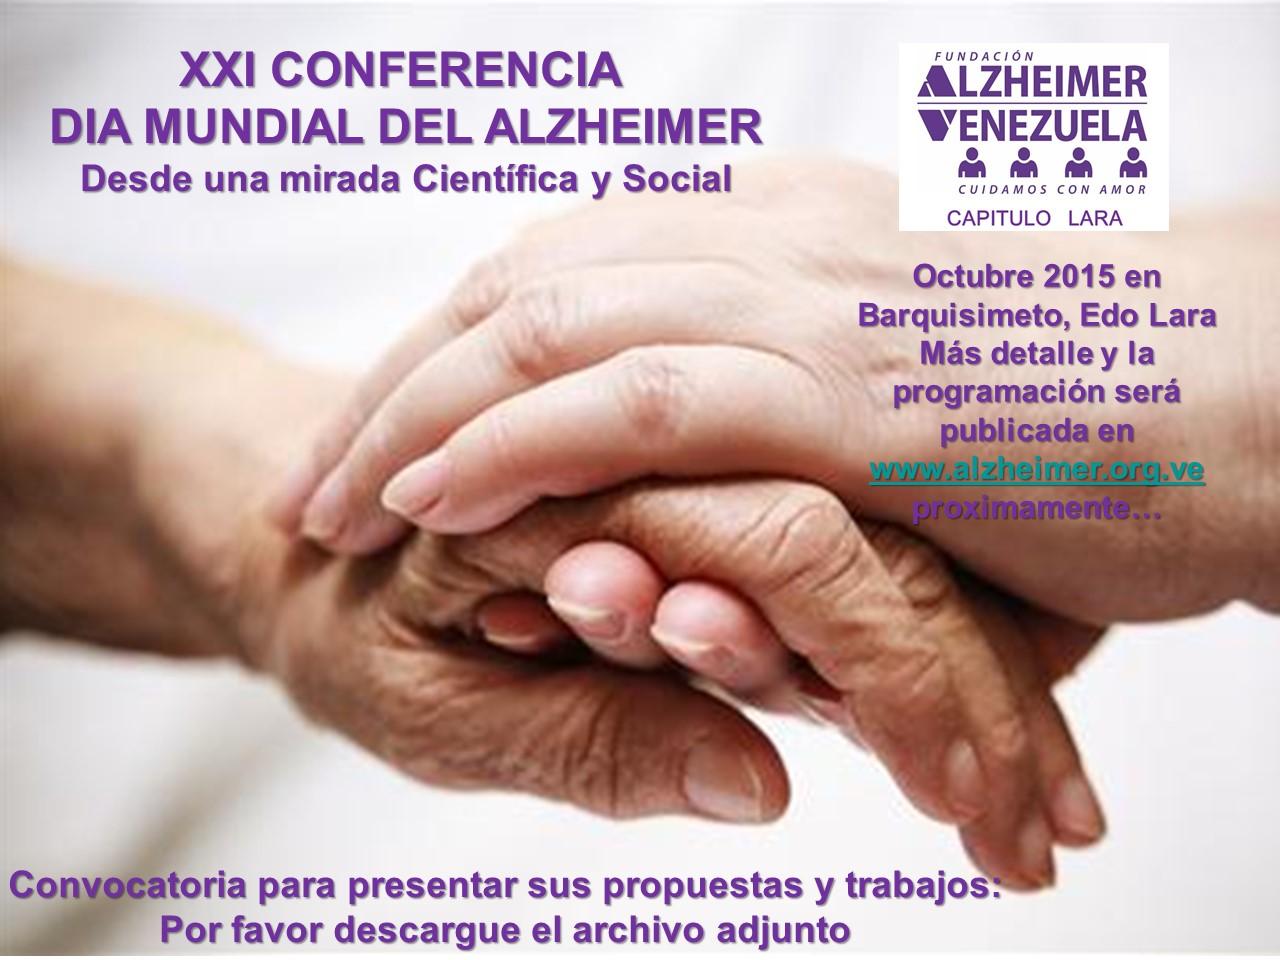 PROPUESTAS XXI CONFERENCIA DIA MUNDIAL DEL ALZHEIMER